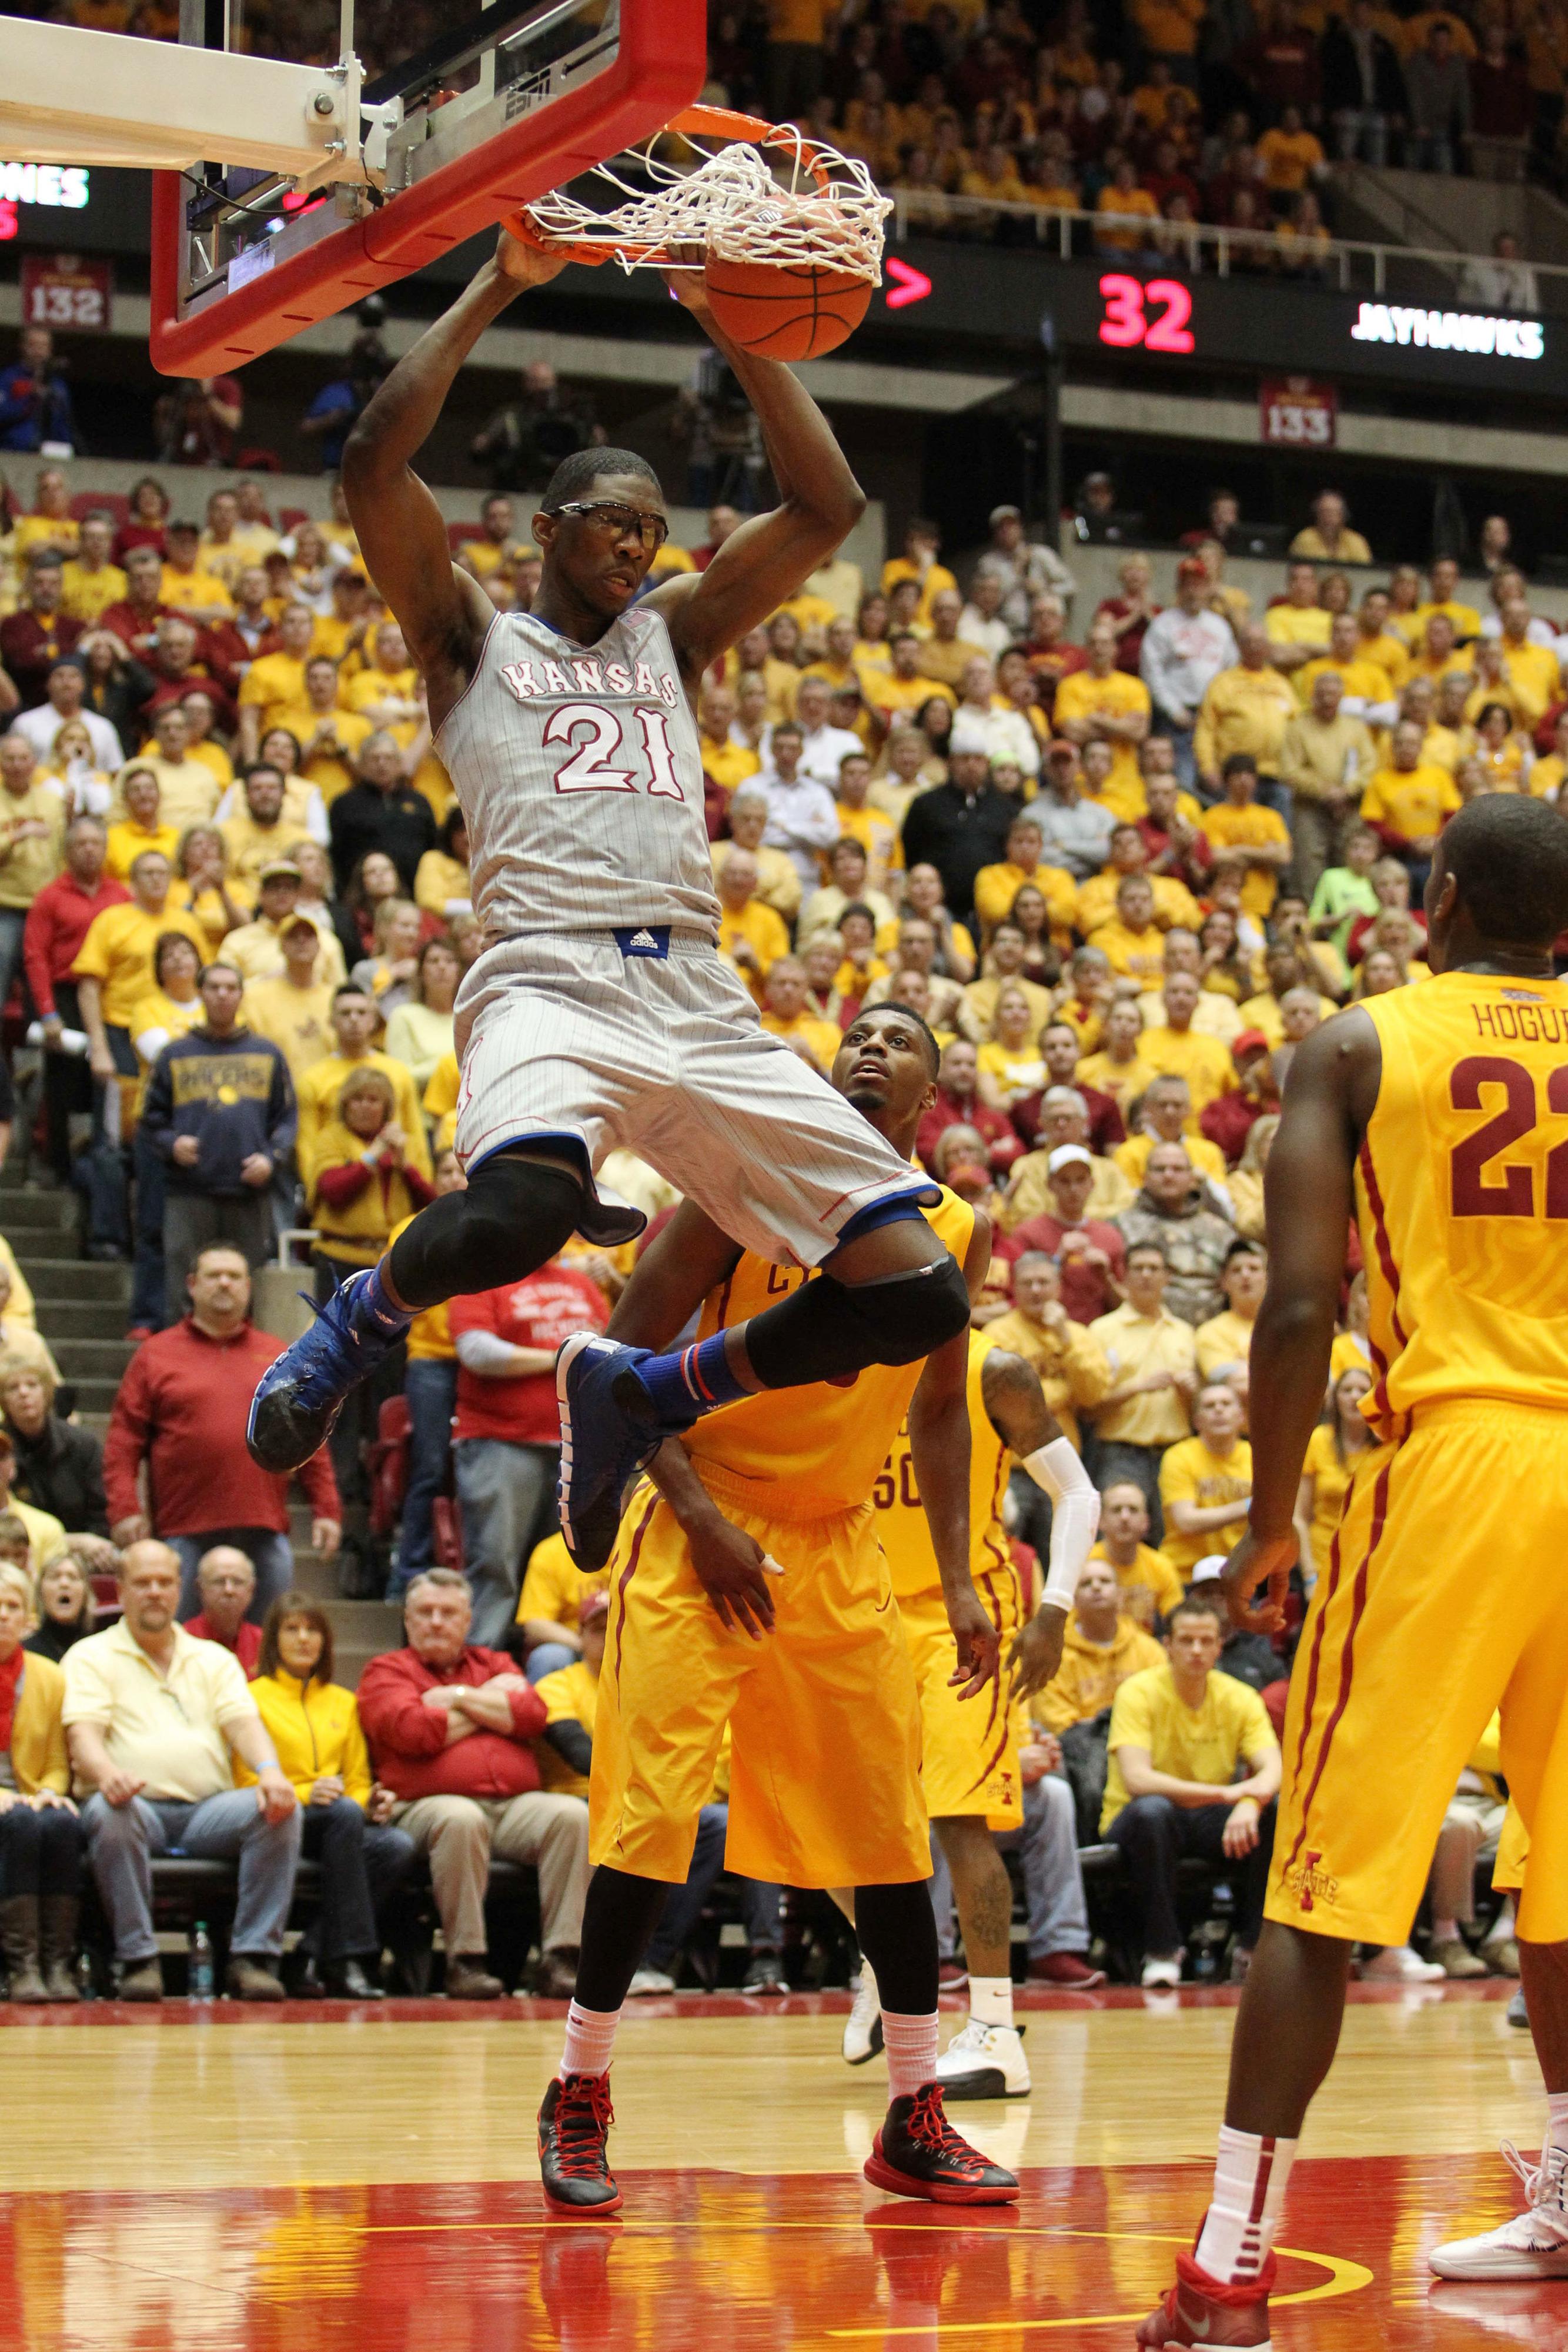 NCAA basketball schedule: Kansas hosts Baylor in Big 12 showdown